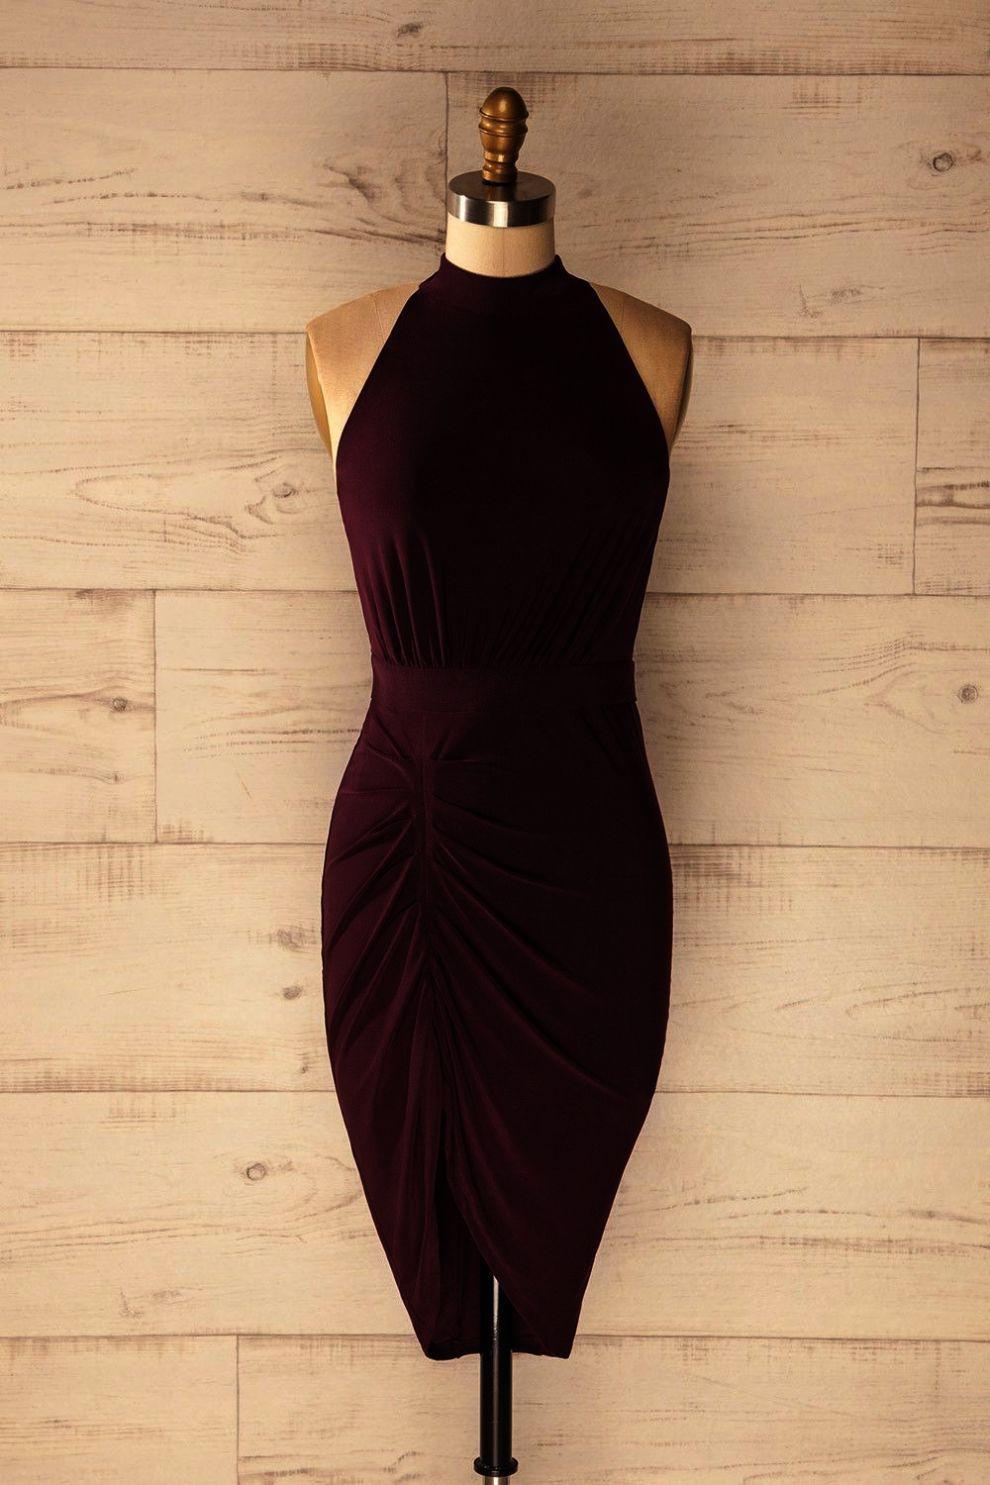 Tight dress brands bodycon dress jacket tight dresses classy